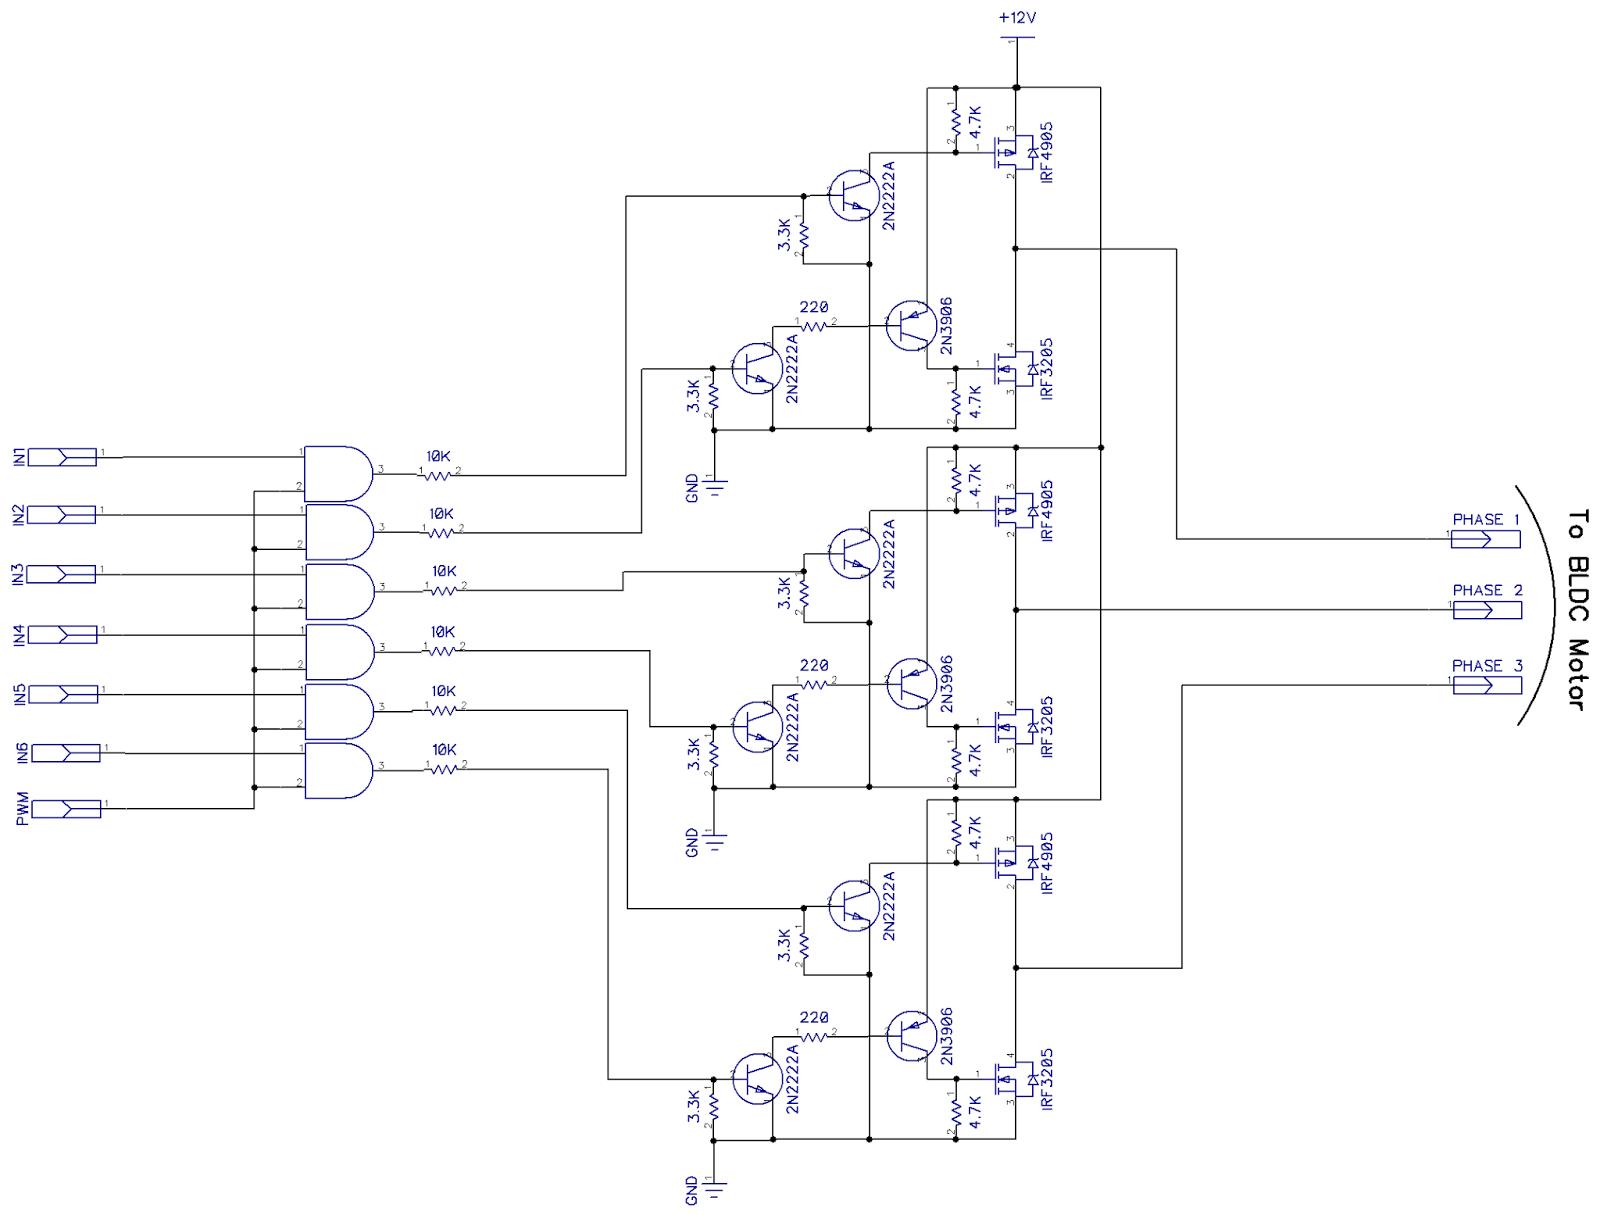 motor for furnace wiring diagram motor discover your wiring ups wiring diagram symbols [ 1600 x 1215 Pixel ]